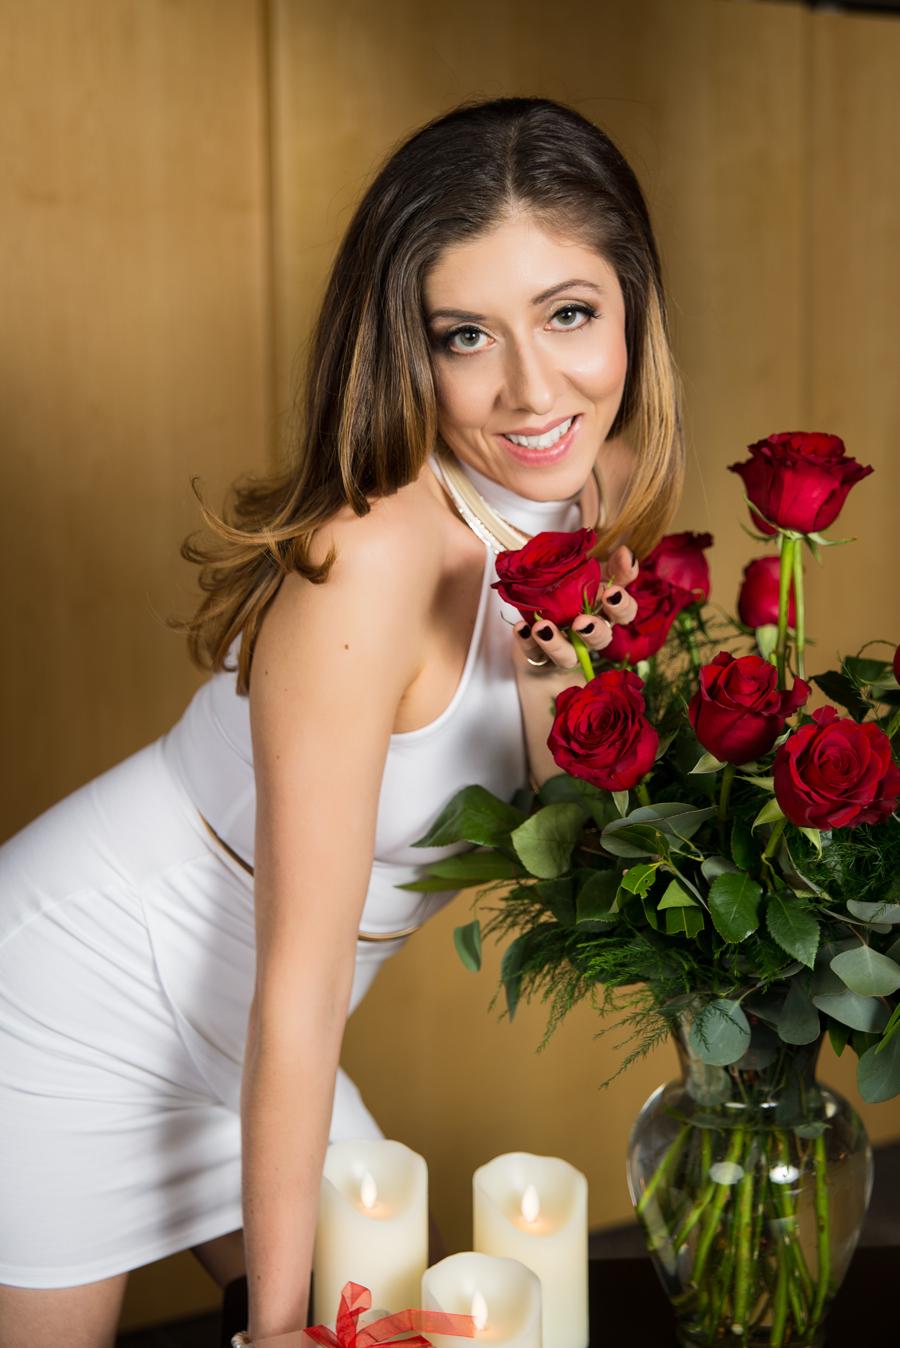 Amelia-Heart-Valentines-2018-42s.jpg